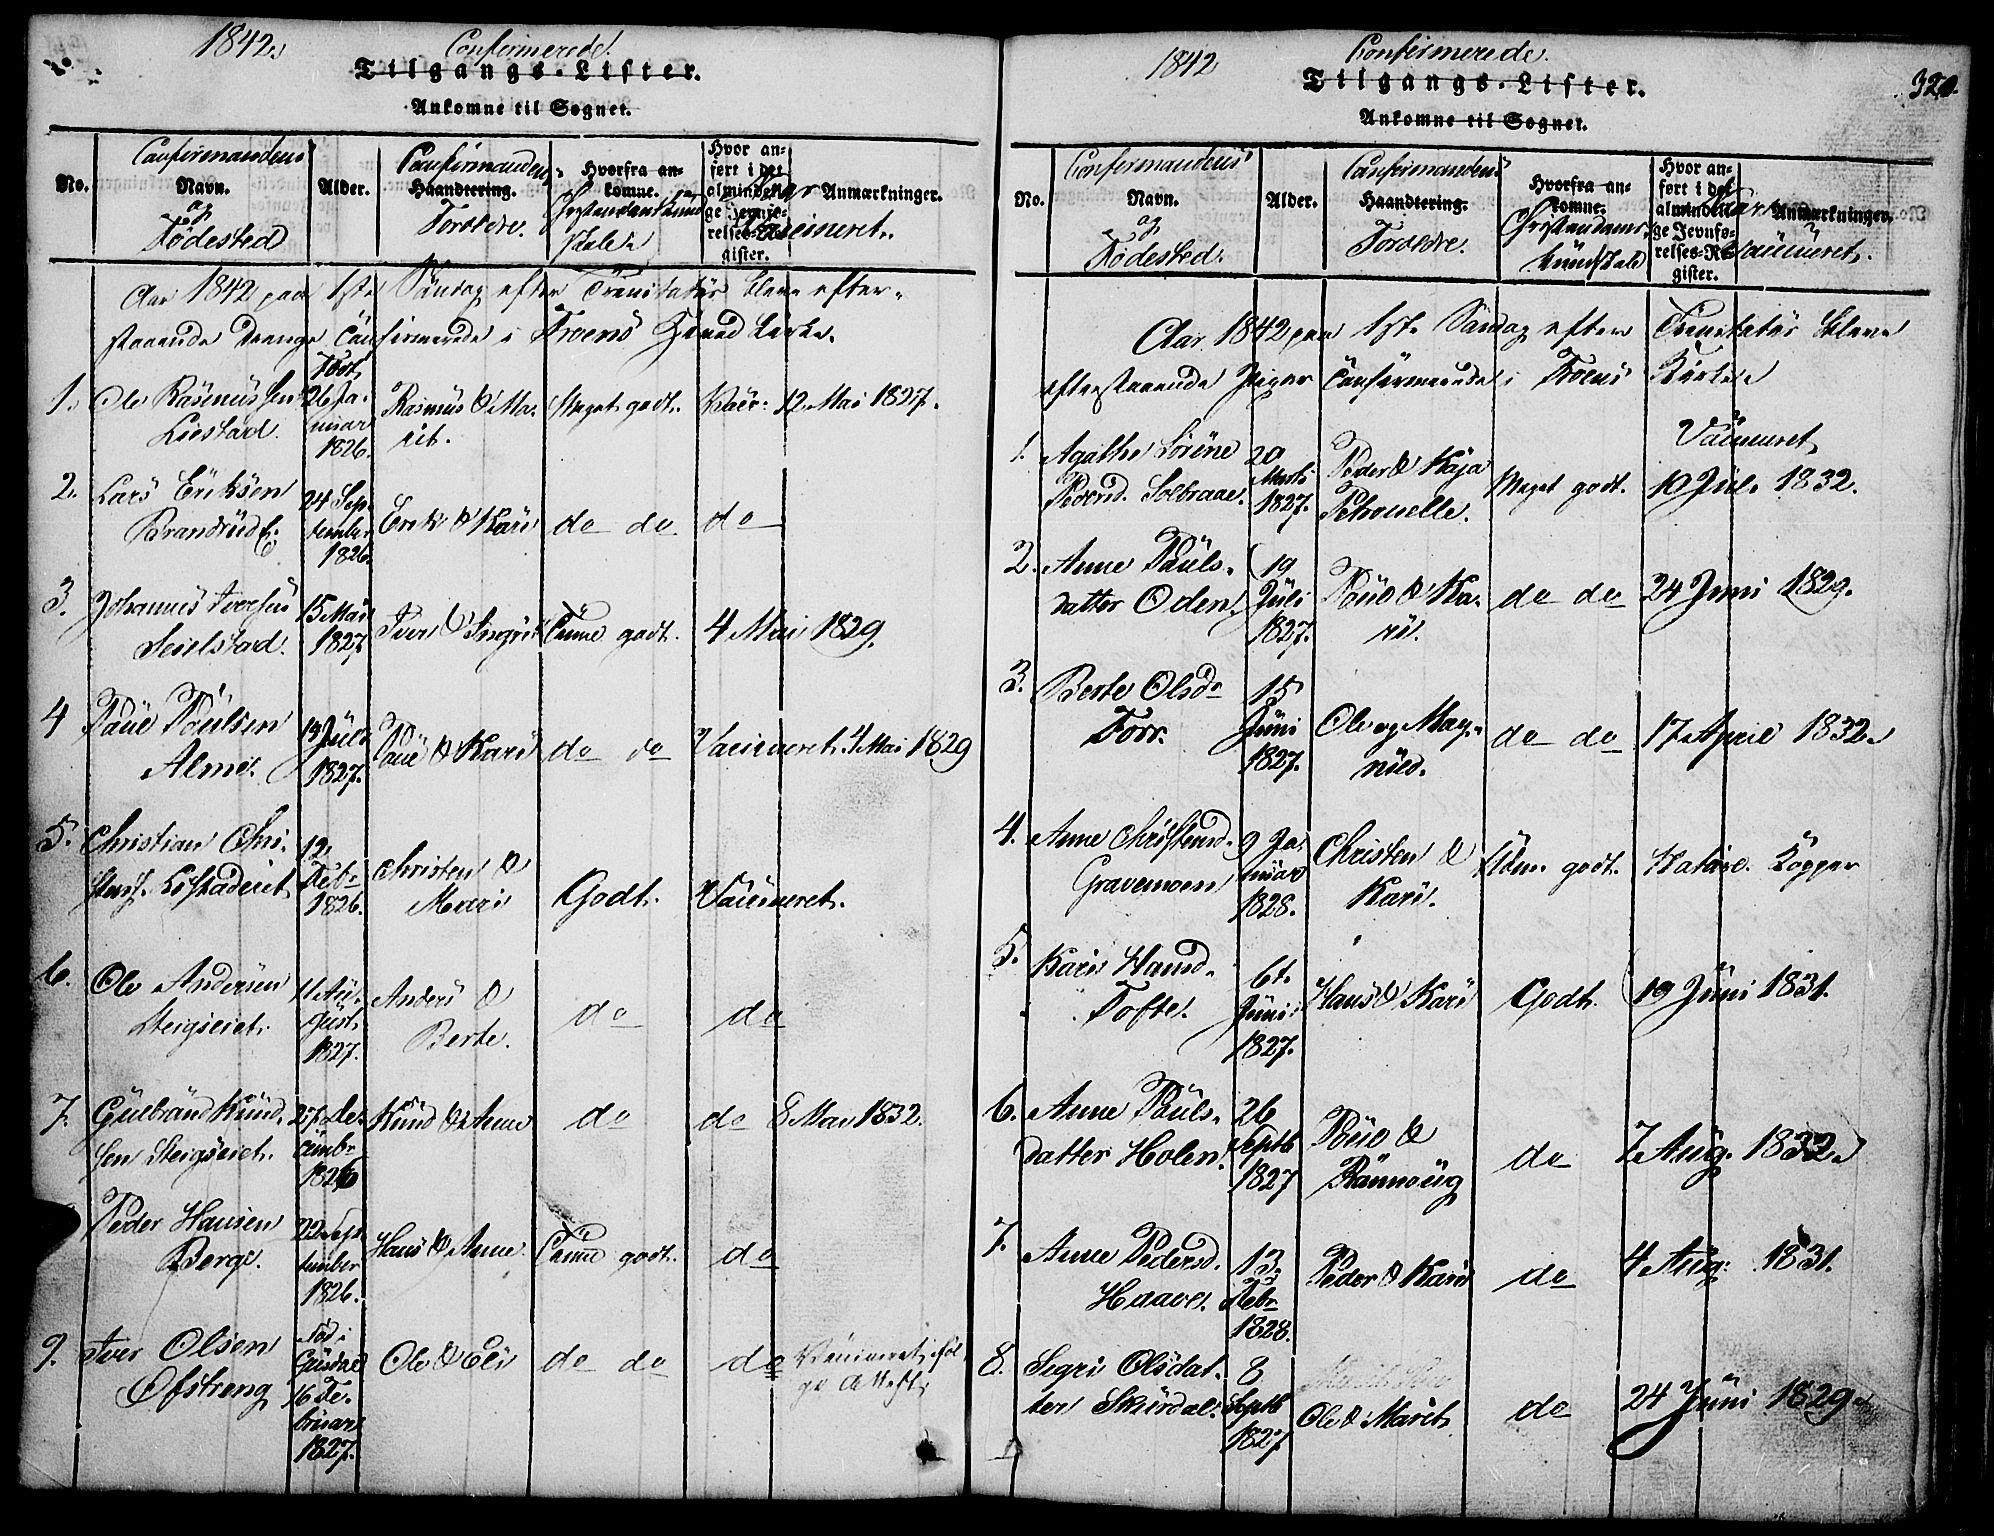 SAH, Fron prestekontor, H/Ha/Hab/L0001: Klokkerbok nr. 1, 1816-1843, s. 320